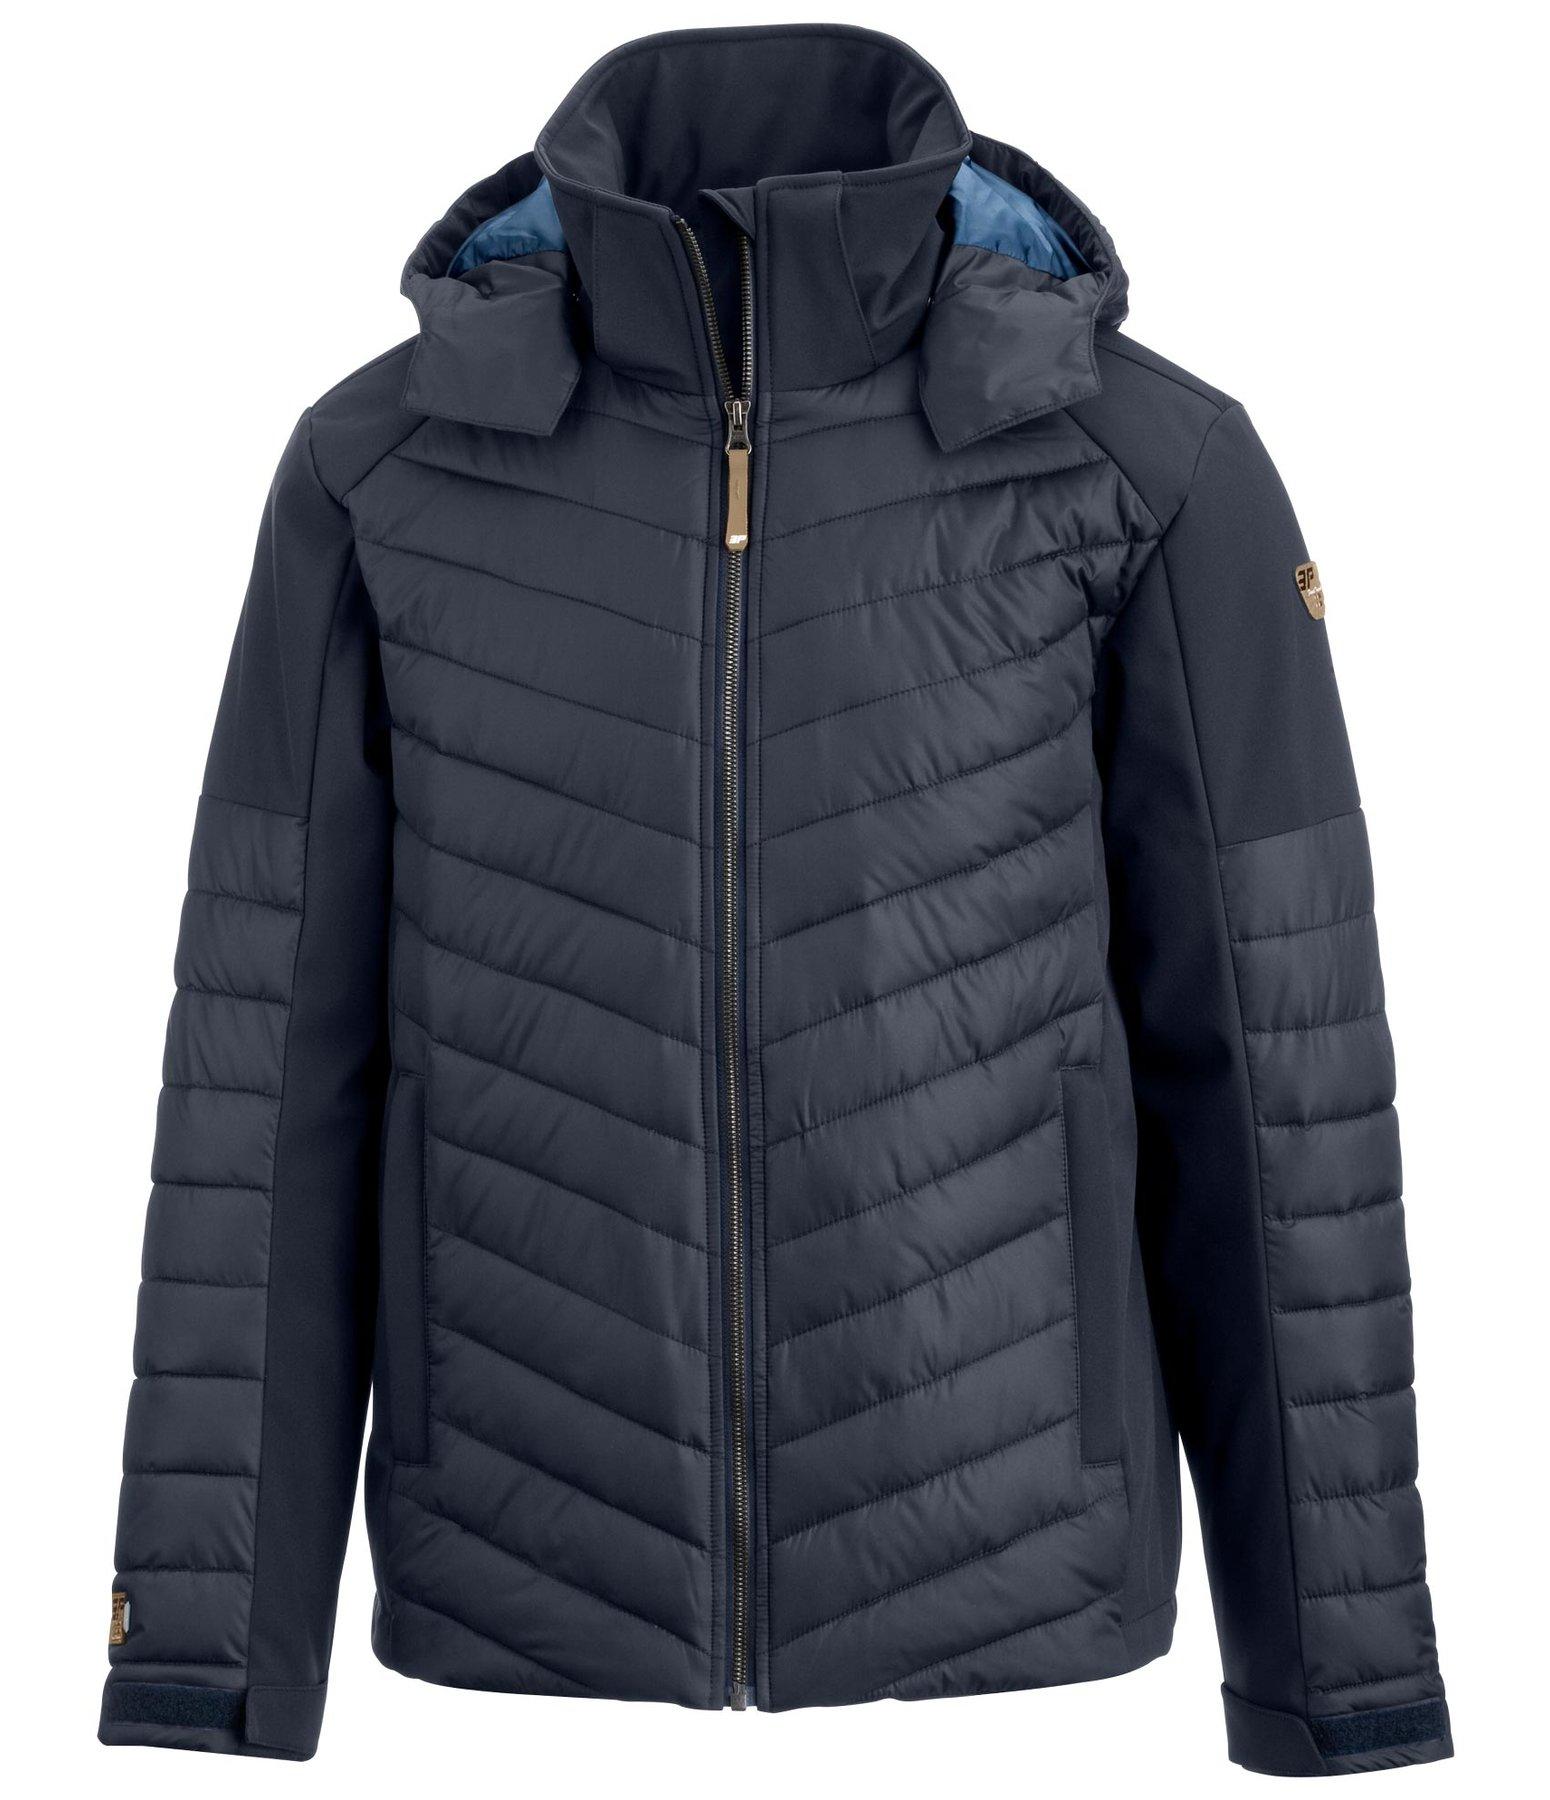 968c481f8 Men's Winter Soft Shell Jacket Tino